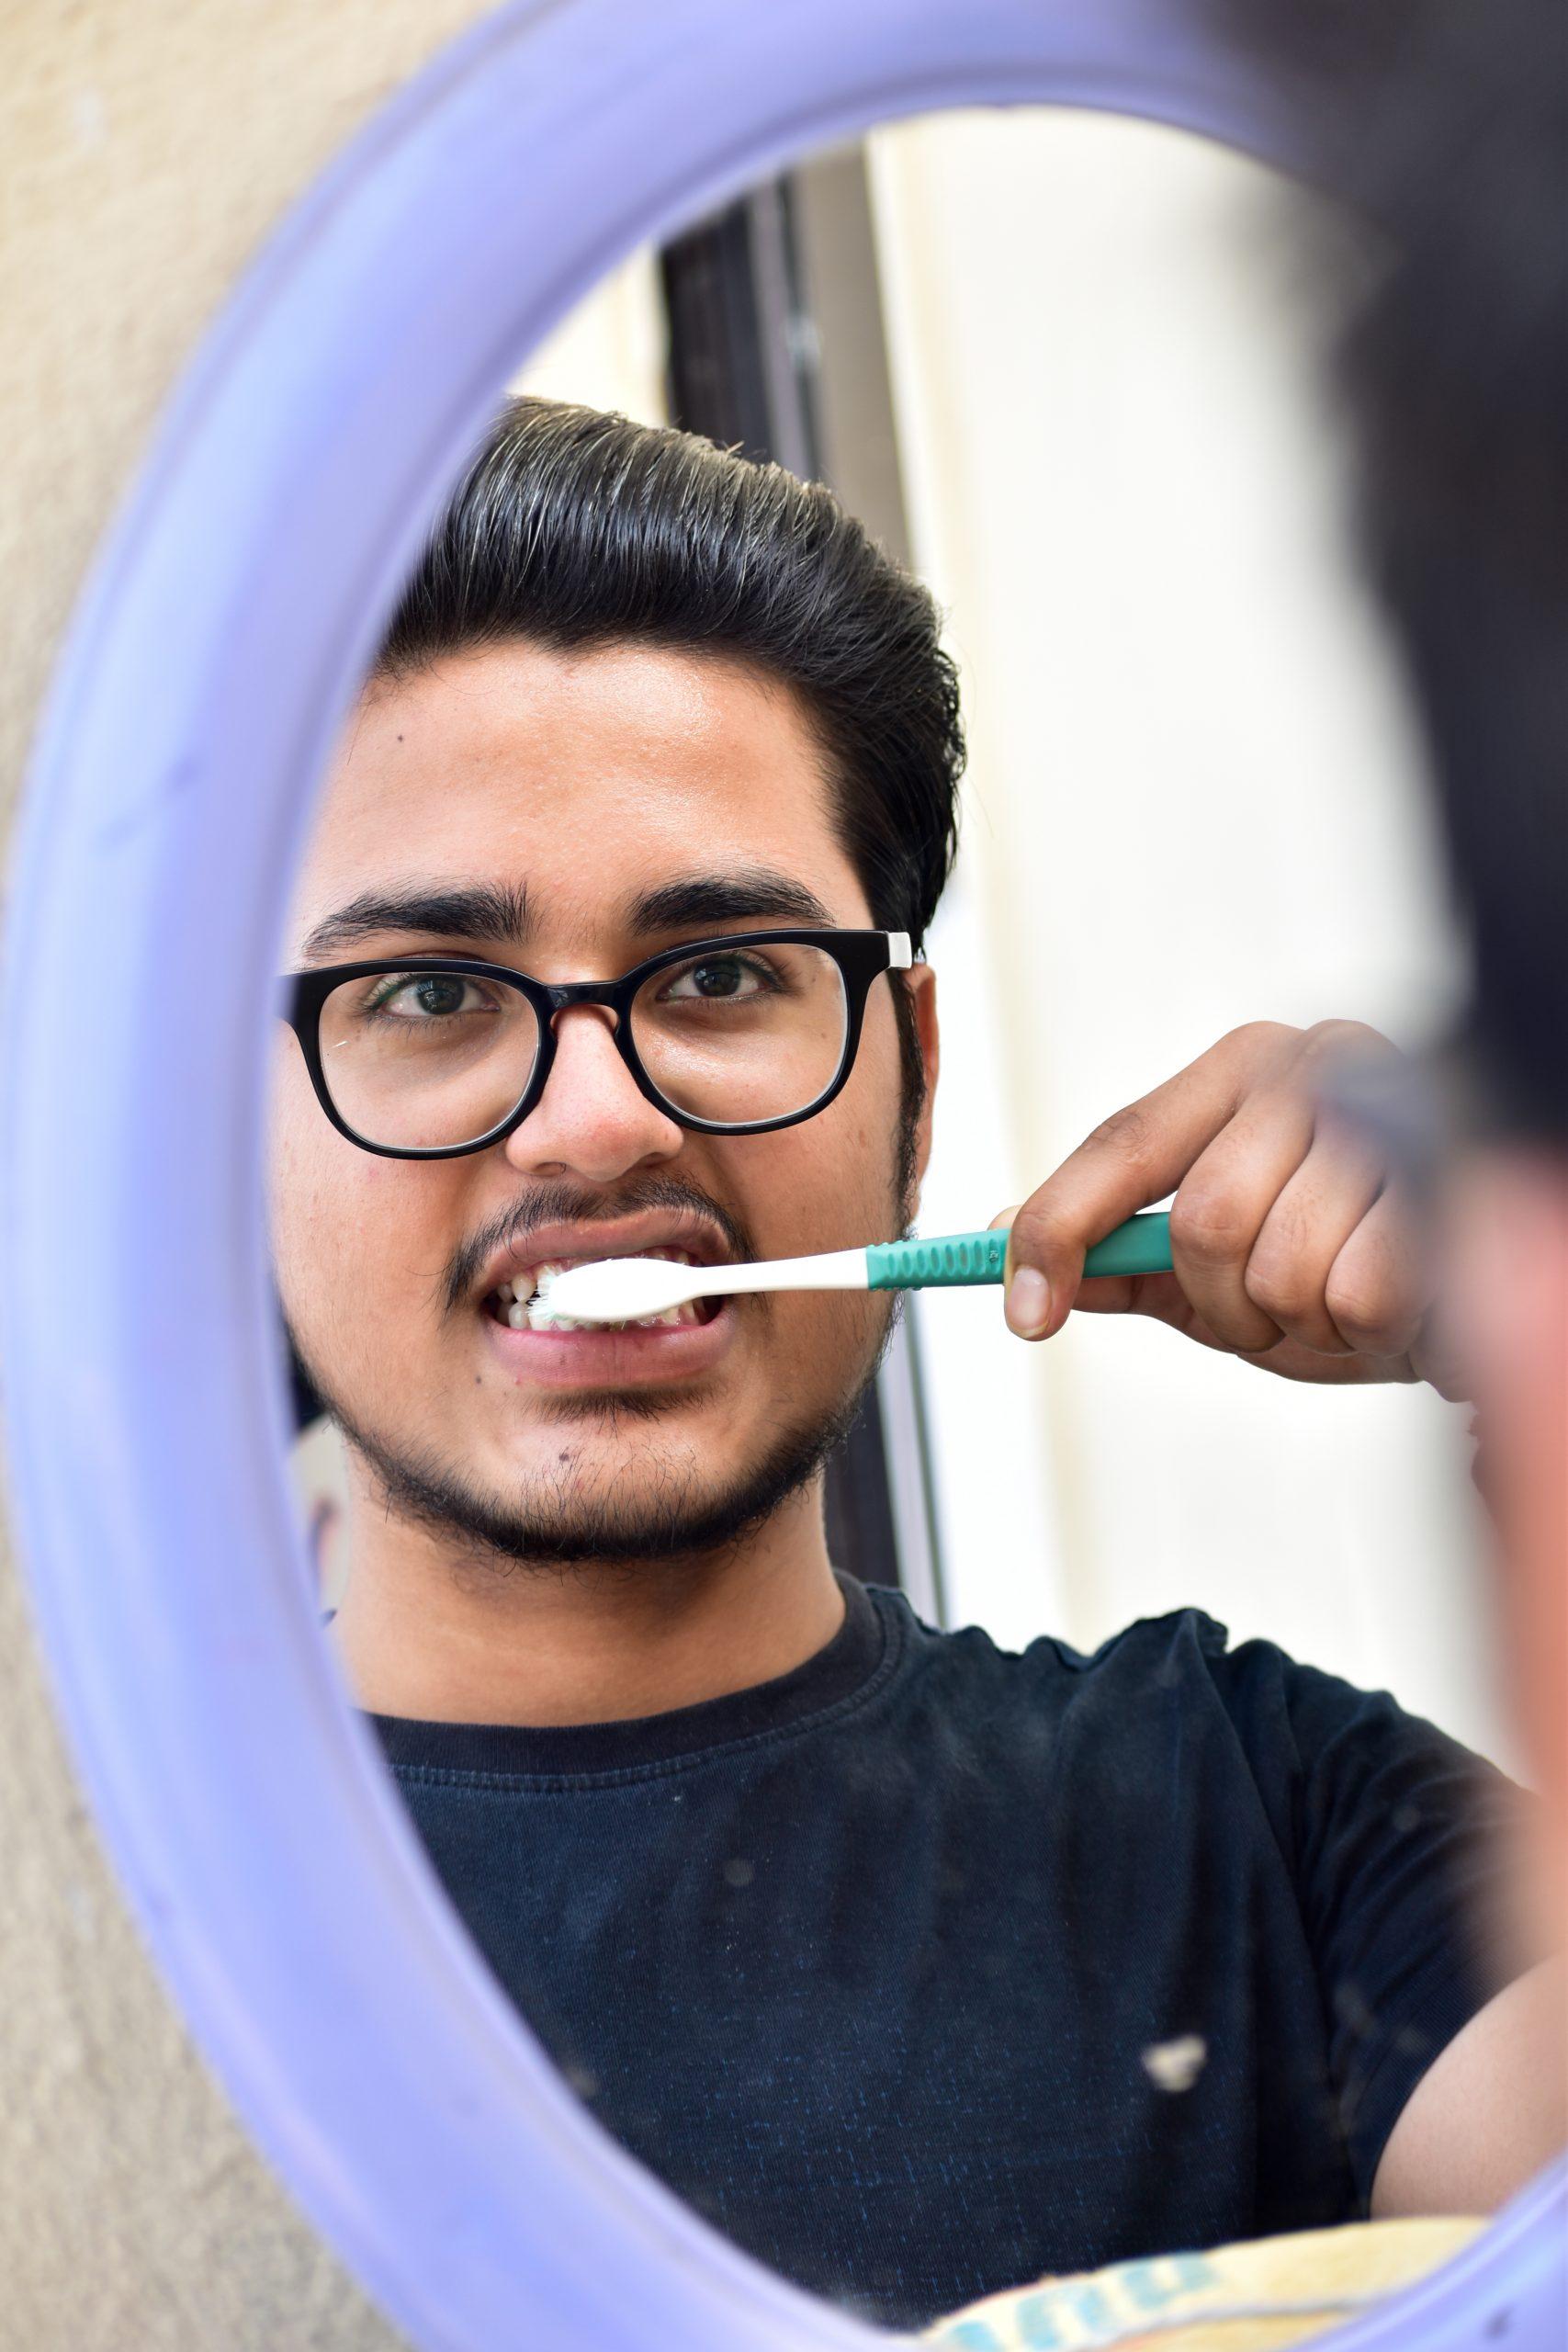 Brushing Teeth in front of mirror